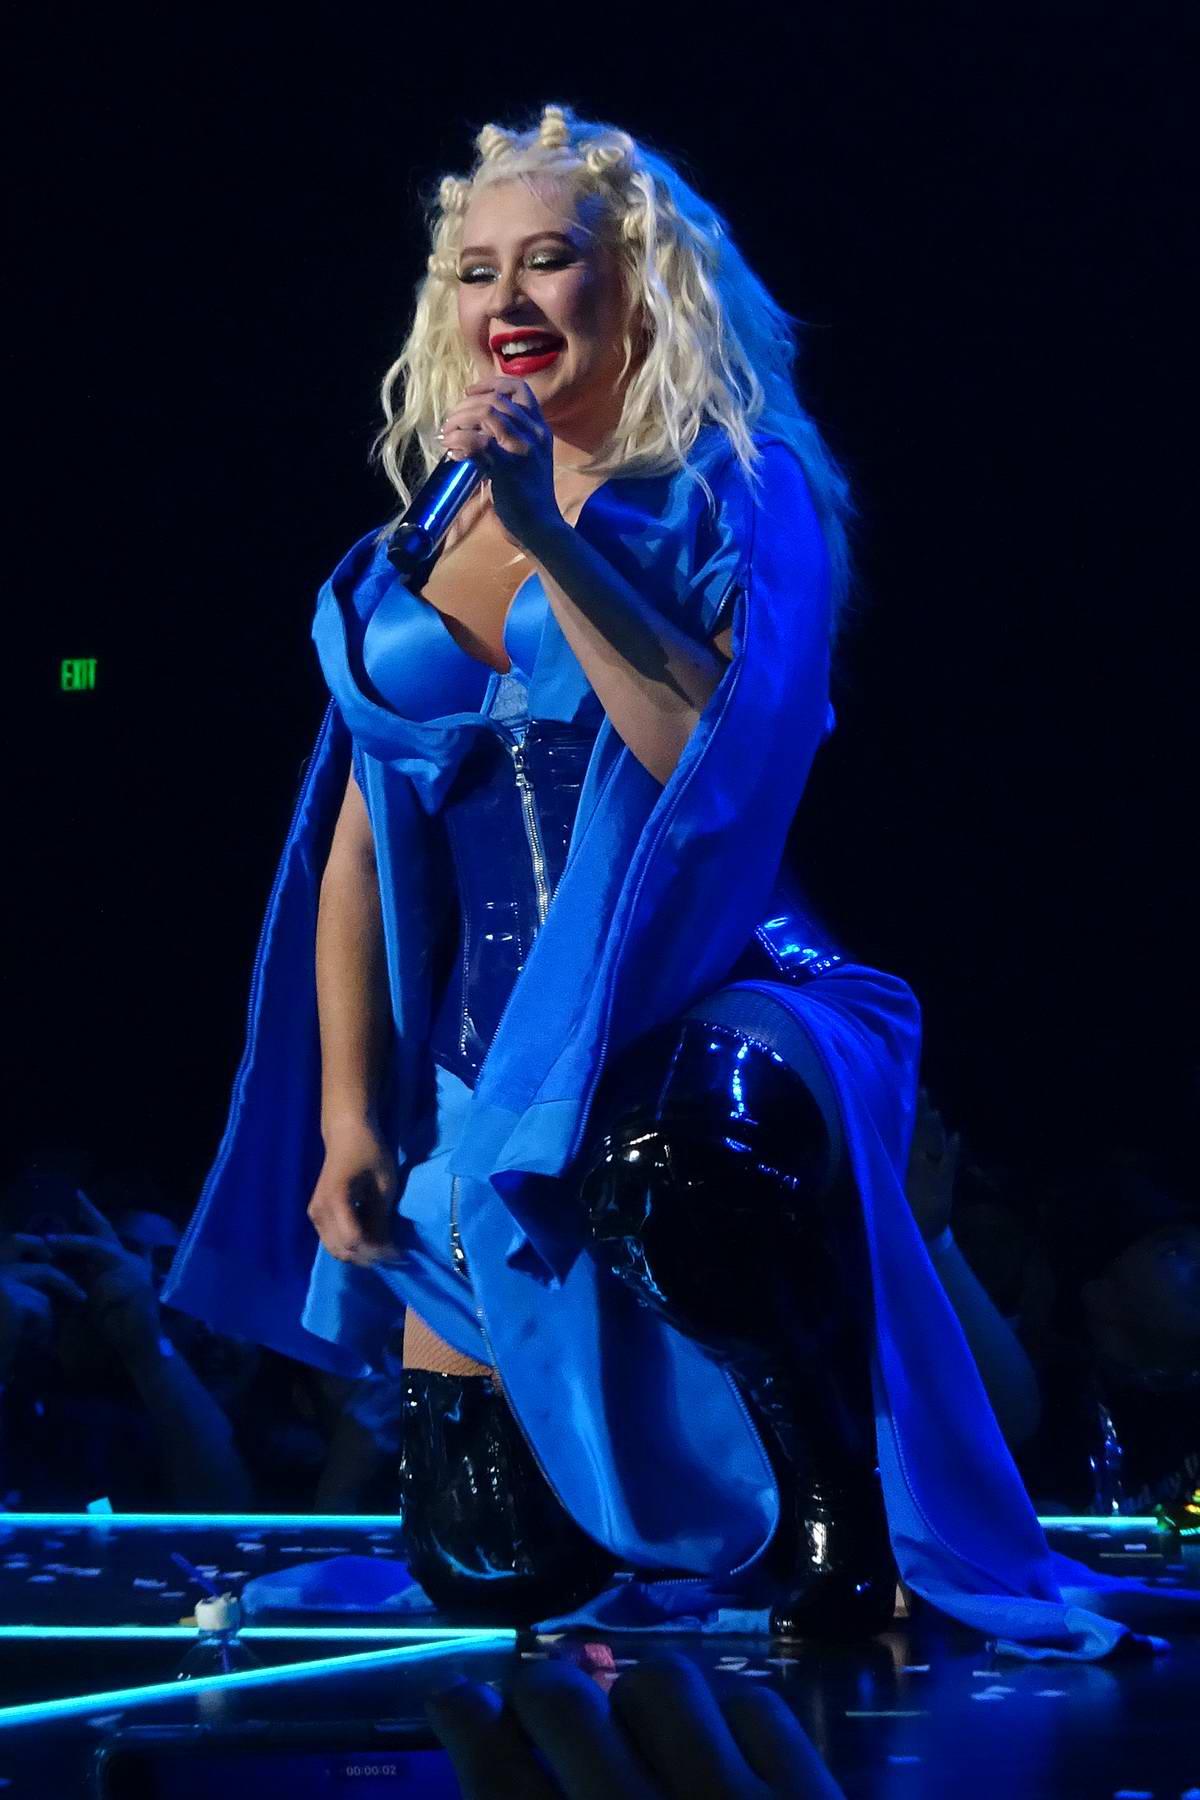 Christina Aguilera performs at the Grand Opening of 'Christina Aguilera: The Xperience' at Planet Hollywood Resort & Casino in Las Vegas, Nevada